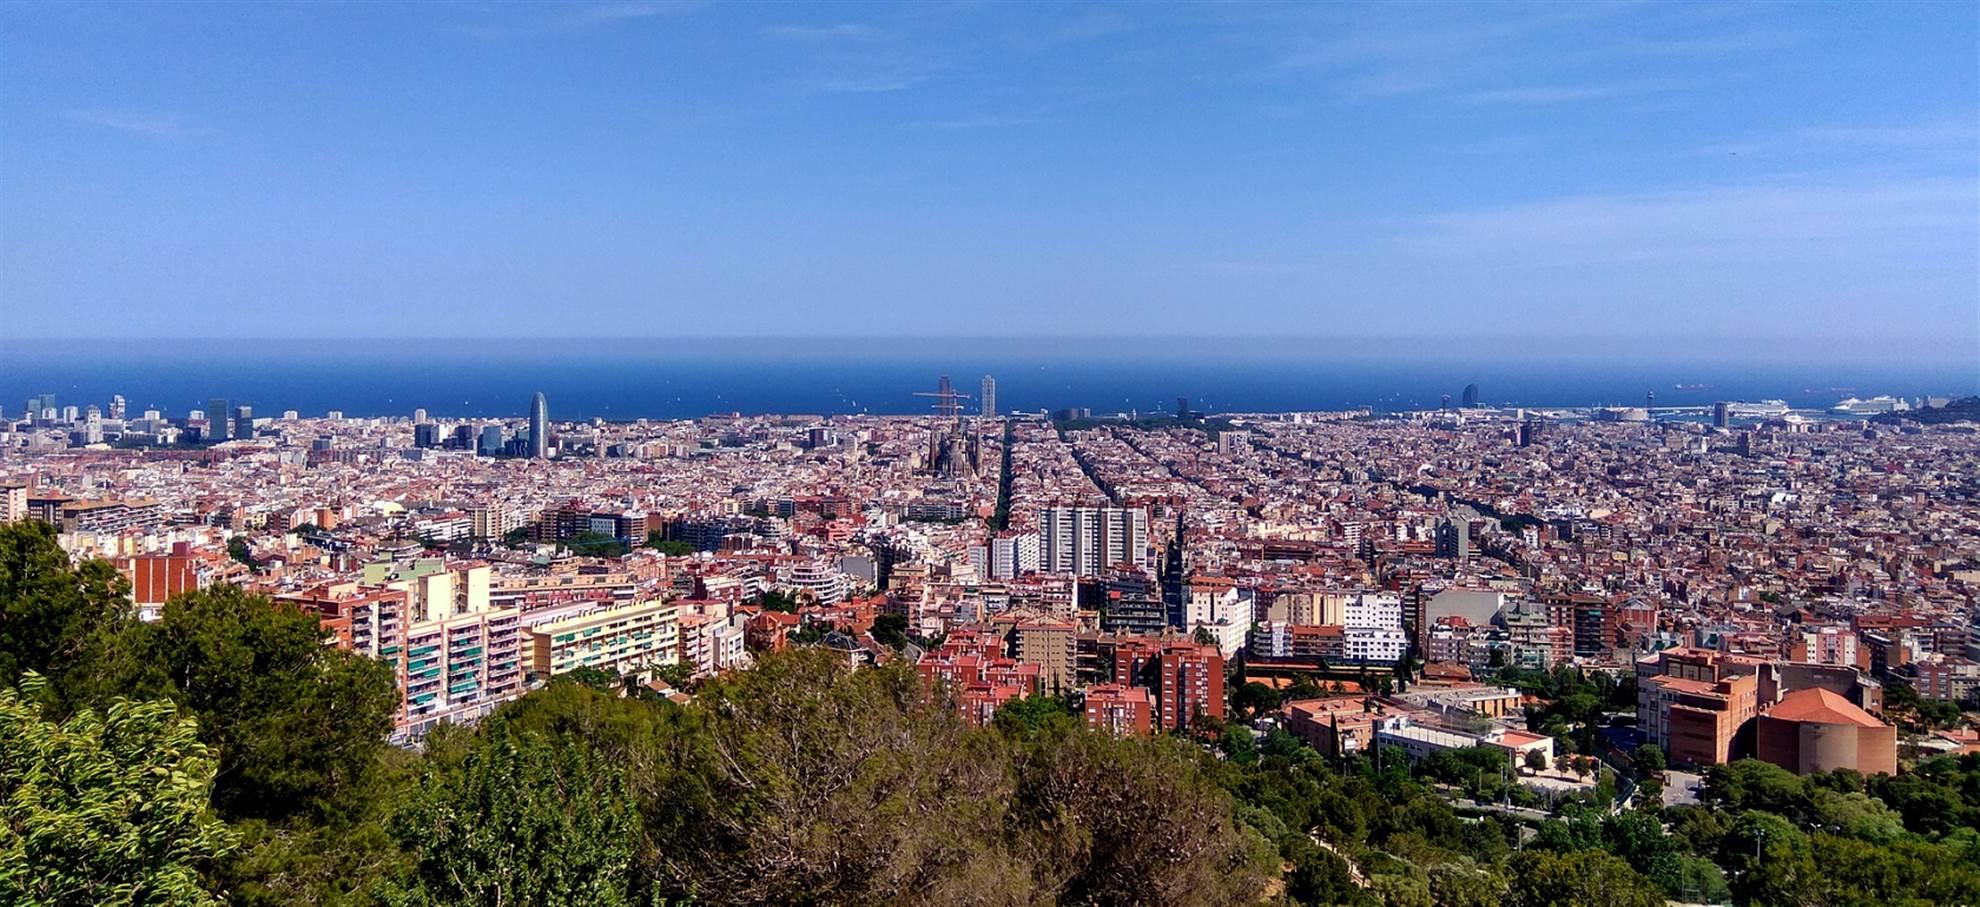 Vol Panoramique au-dessus de Barcelone